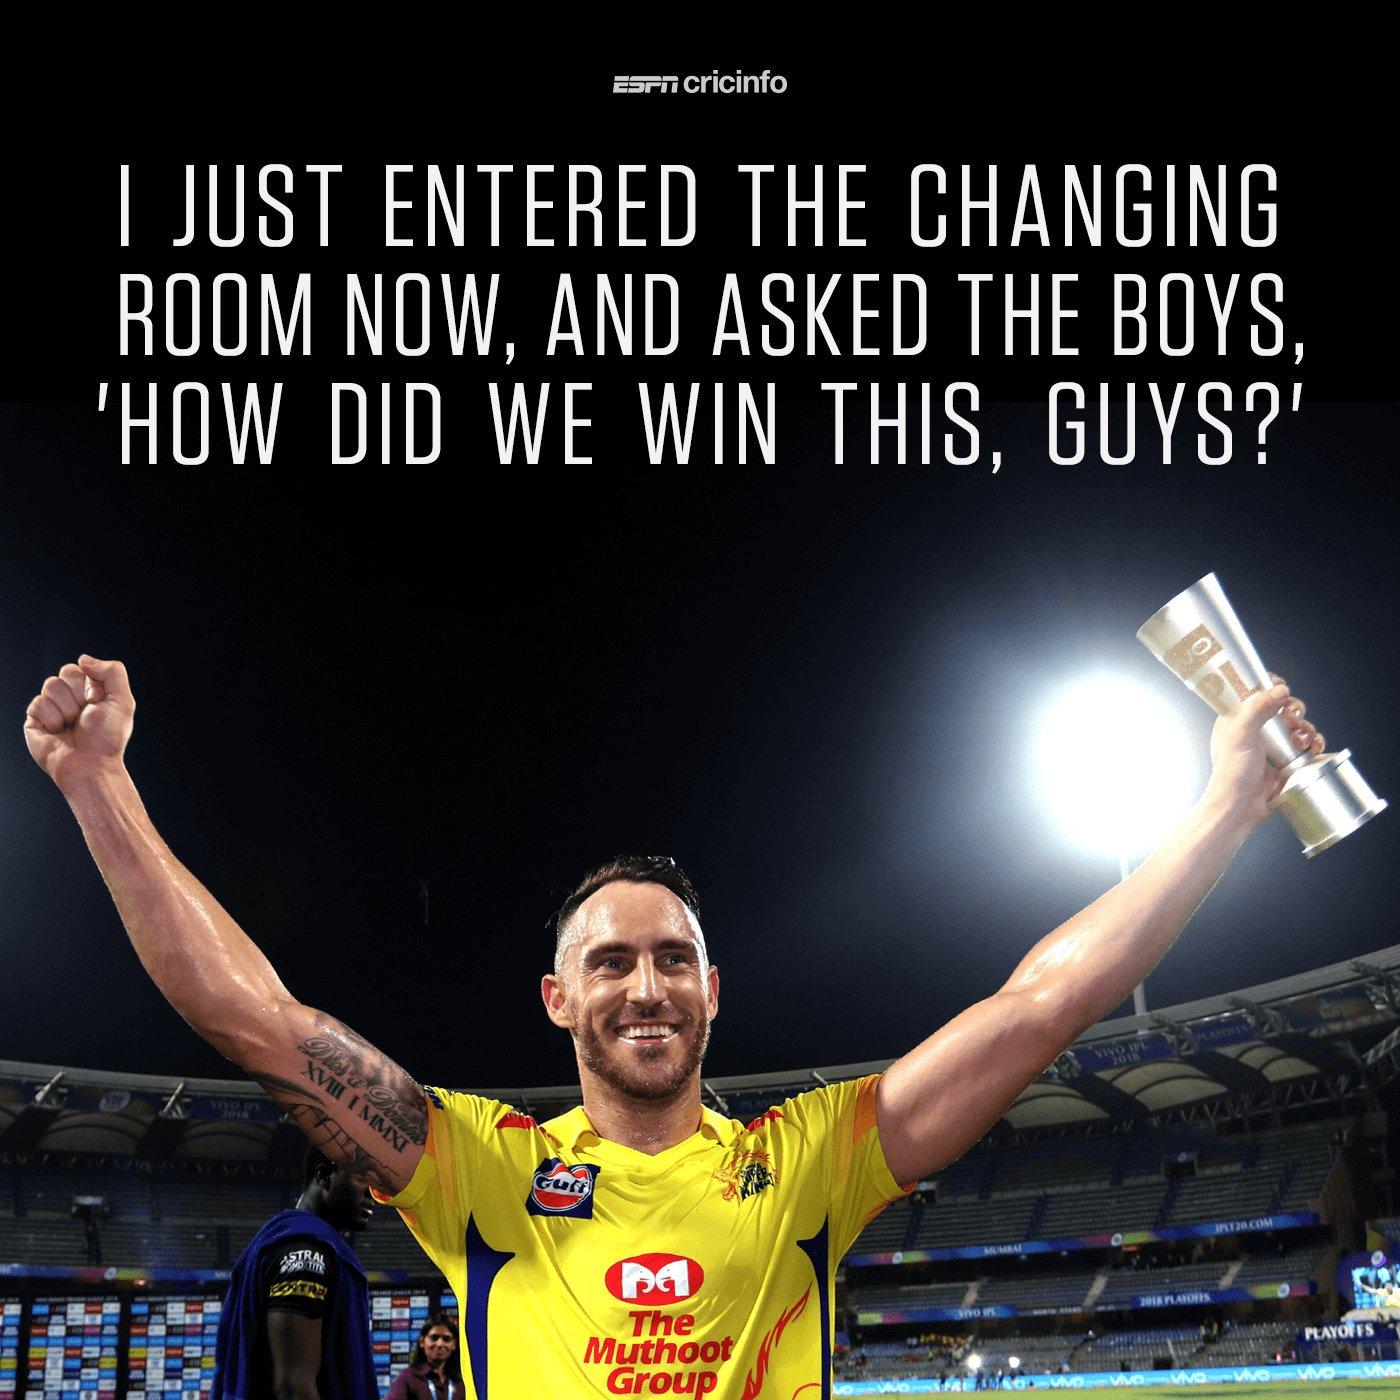 Chennai comeback ��s   https://t.co/s86Pr319Am #SRHvCSK #IPL  #Qualifier1 https://t.co/mp7T75jBW1